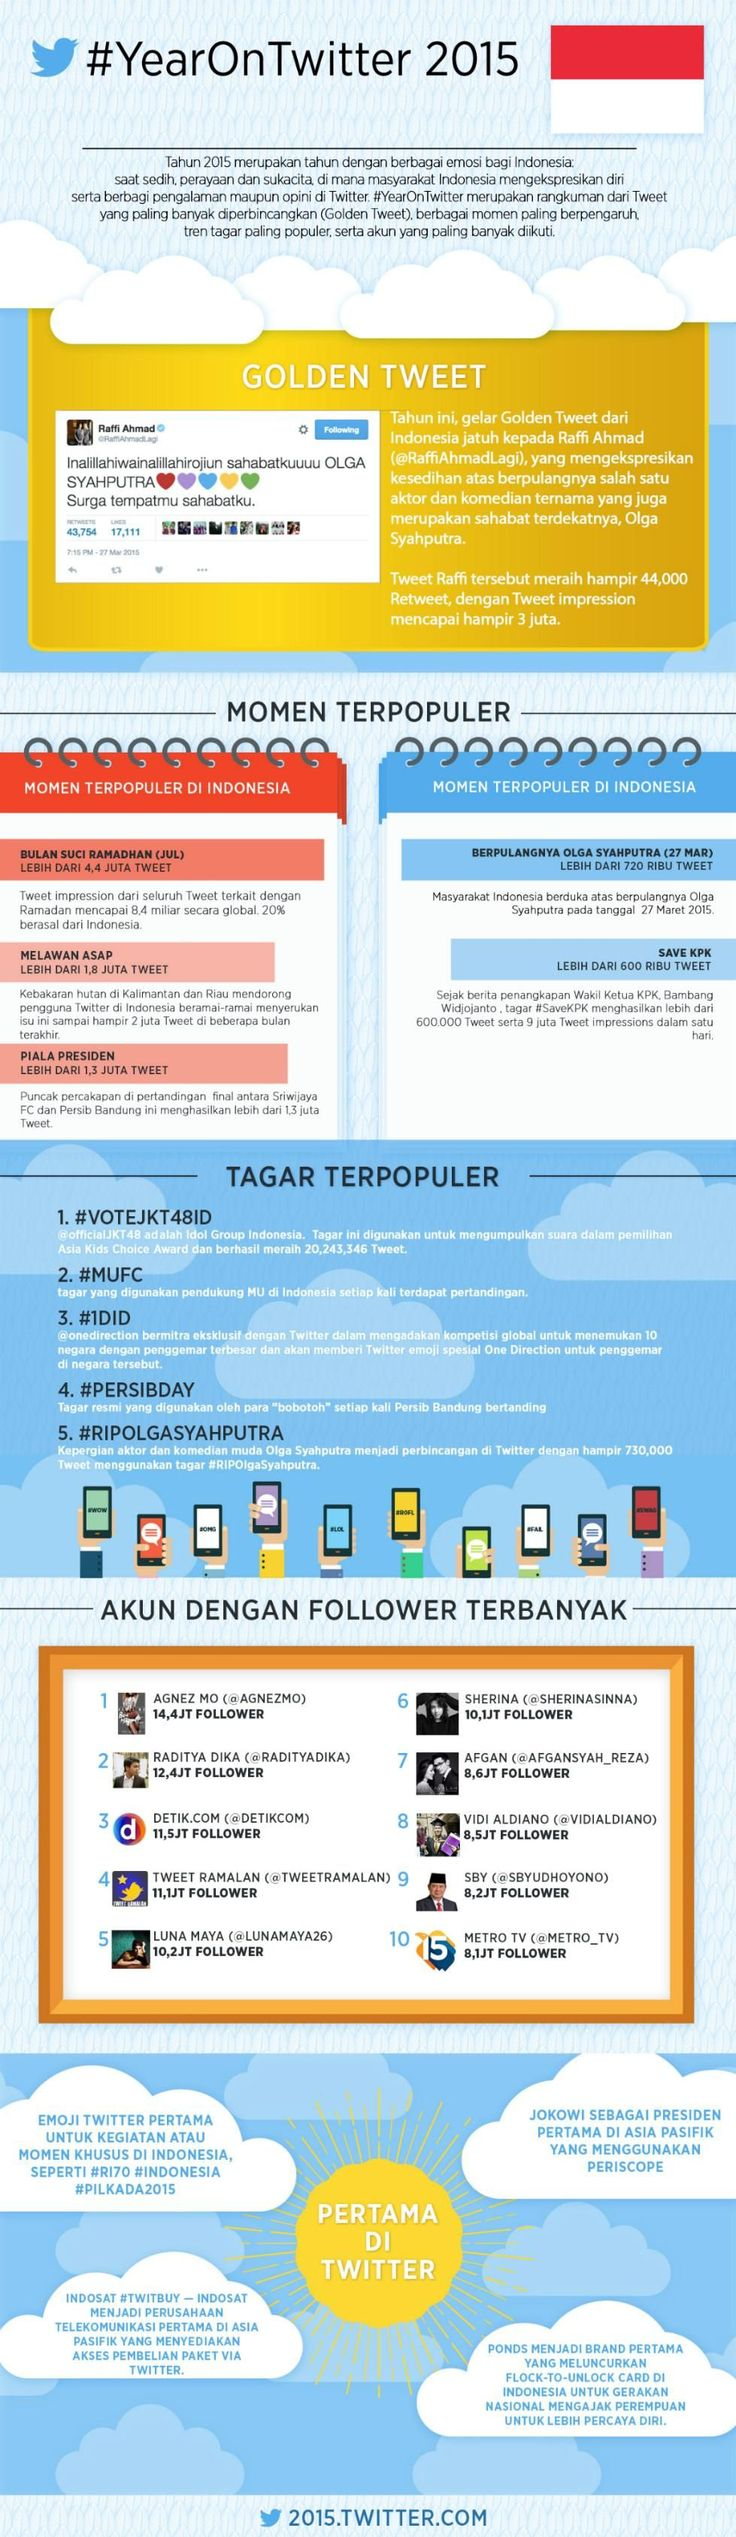 Infografis yang berisi rangkuman mengenai #YearOnTwitter 2015 di Indonesia.